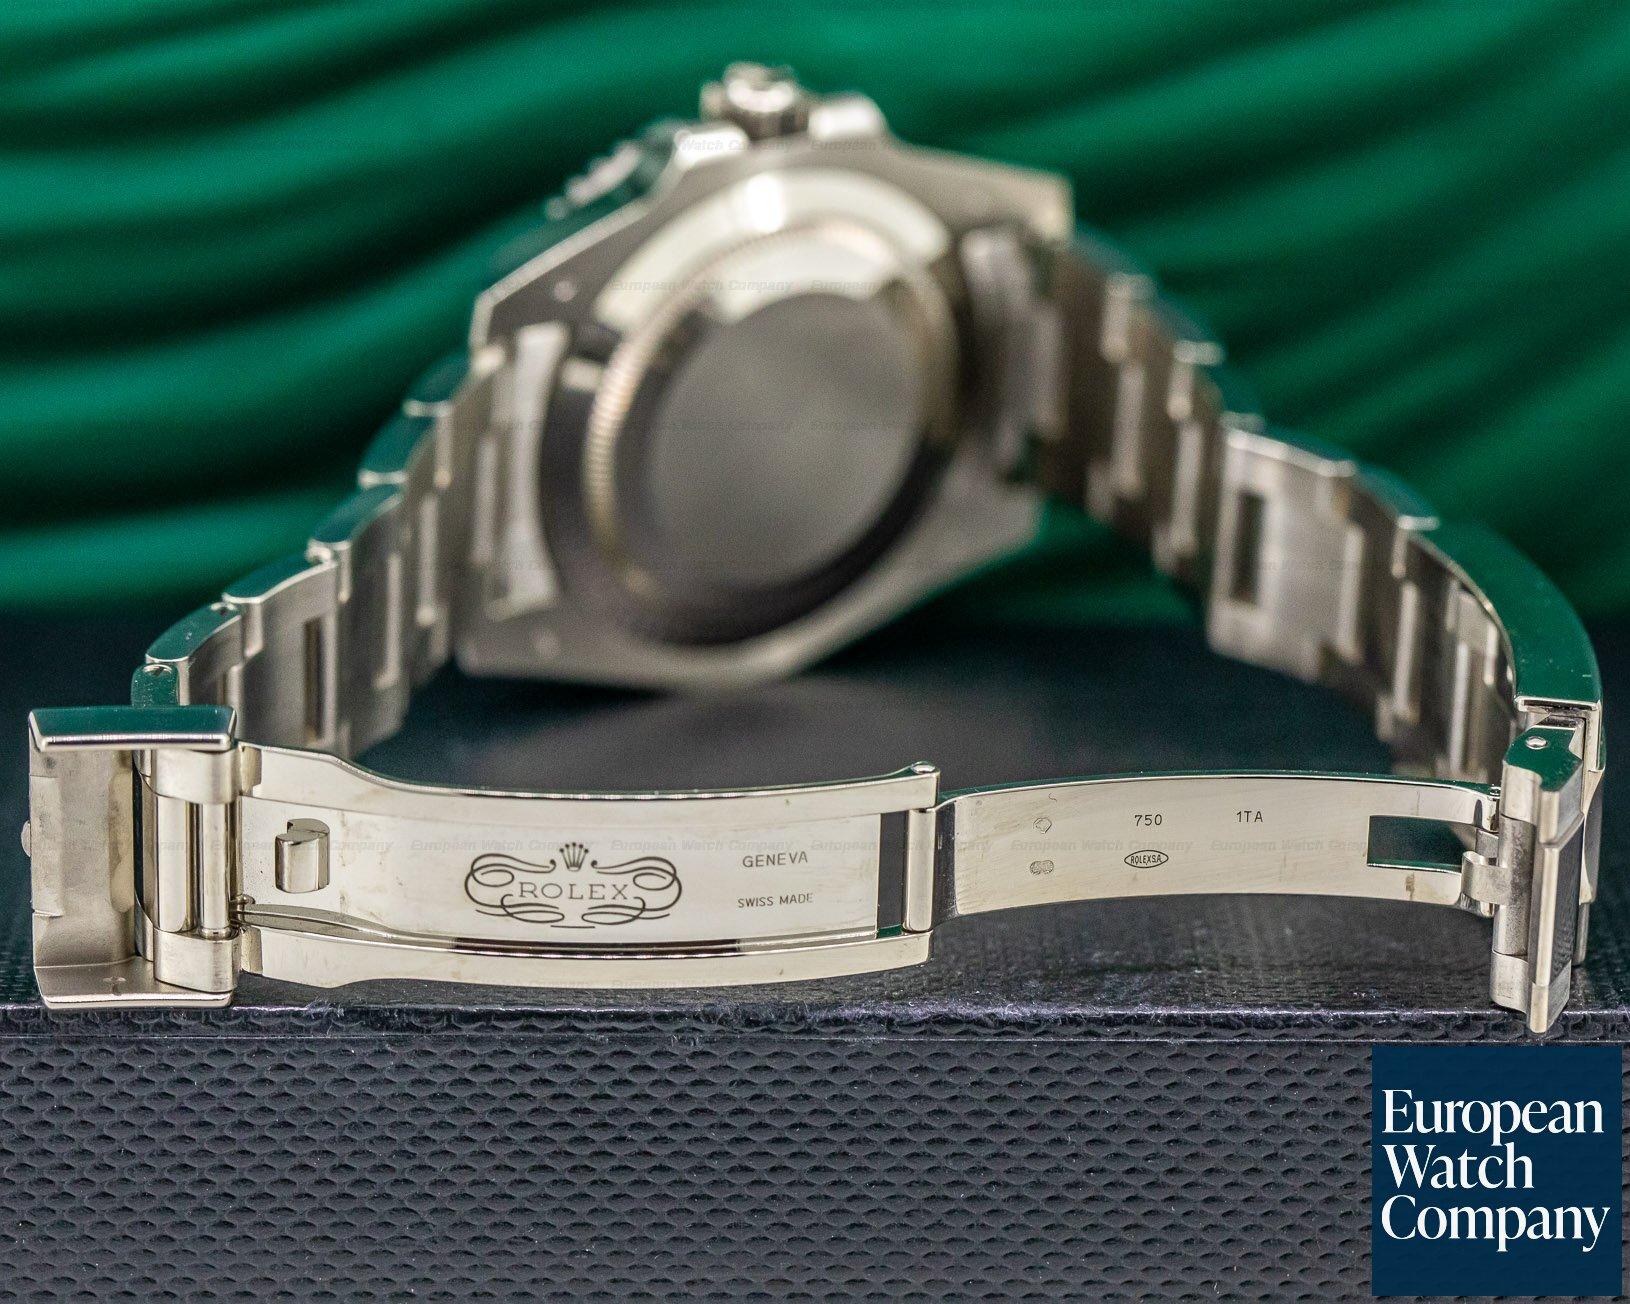 Rolex 116619LB Submariner 18K White Gold Blue Dial